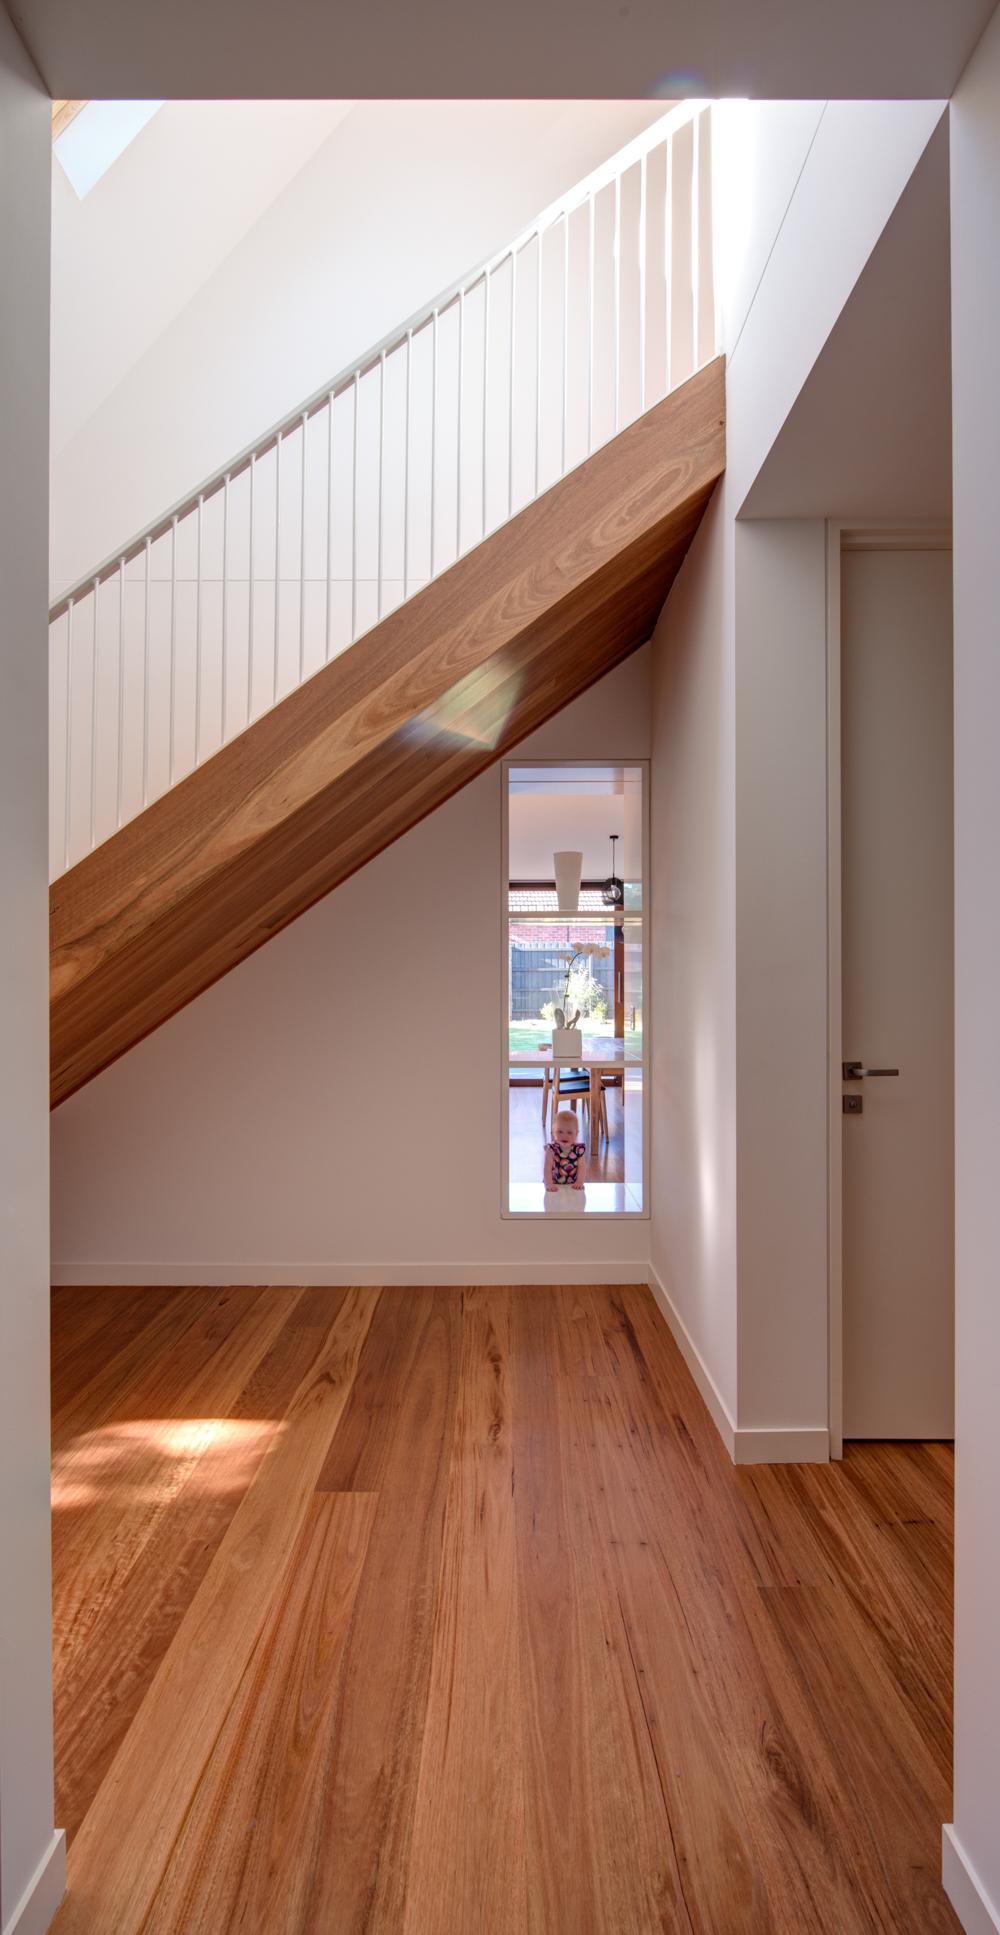 ford-street-house-chaulk-studio-the-design-emotive-09.jpg